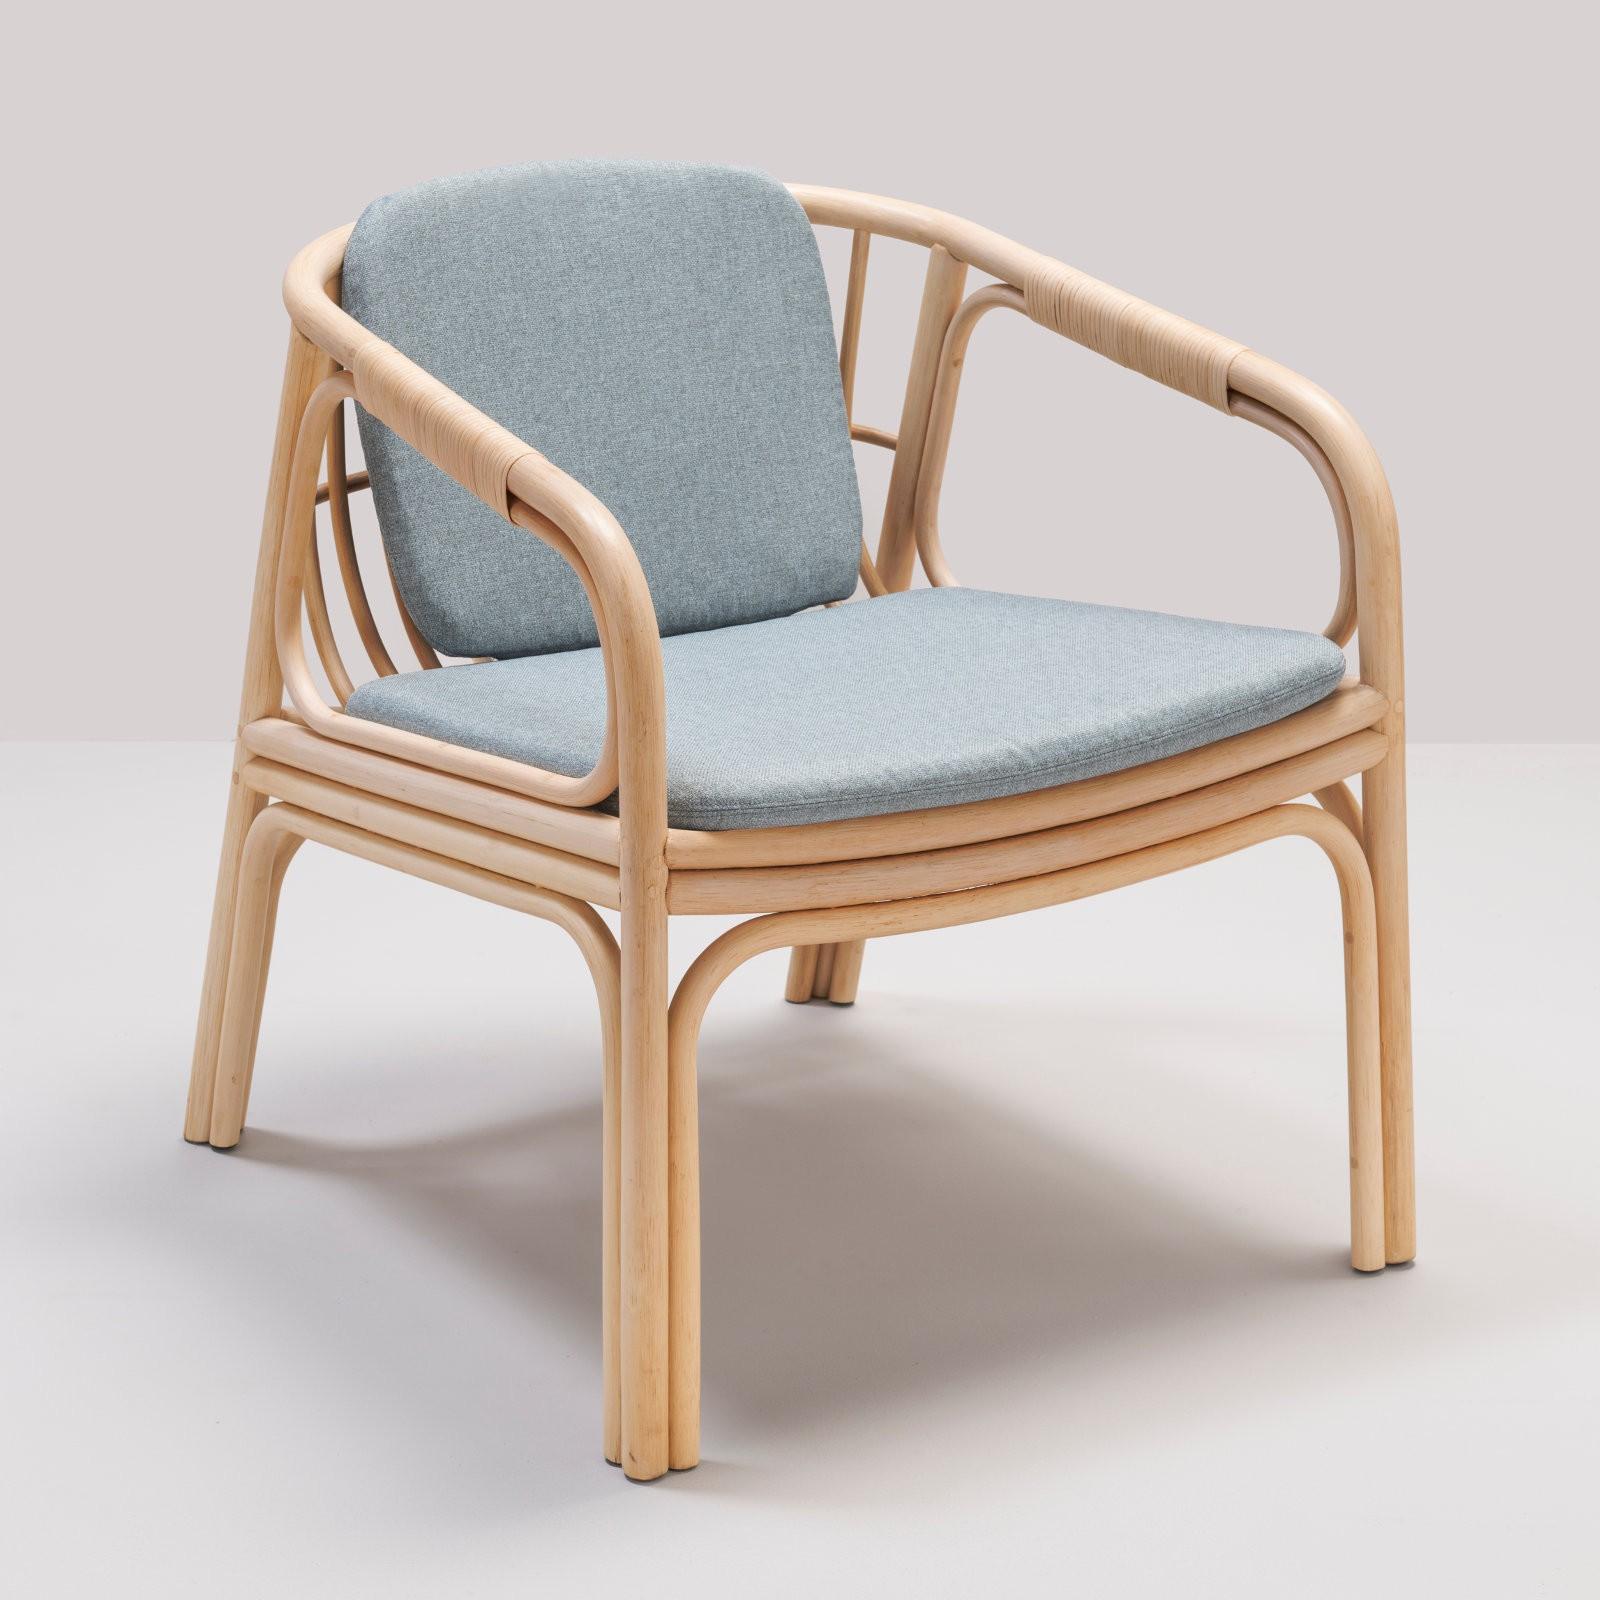 Hublot Rattan Armchair Designed By Guillaume Delvigne